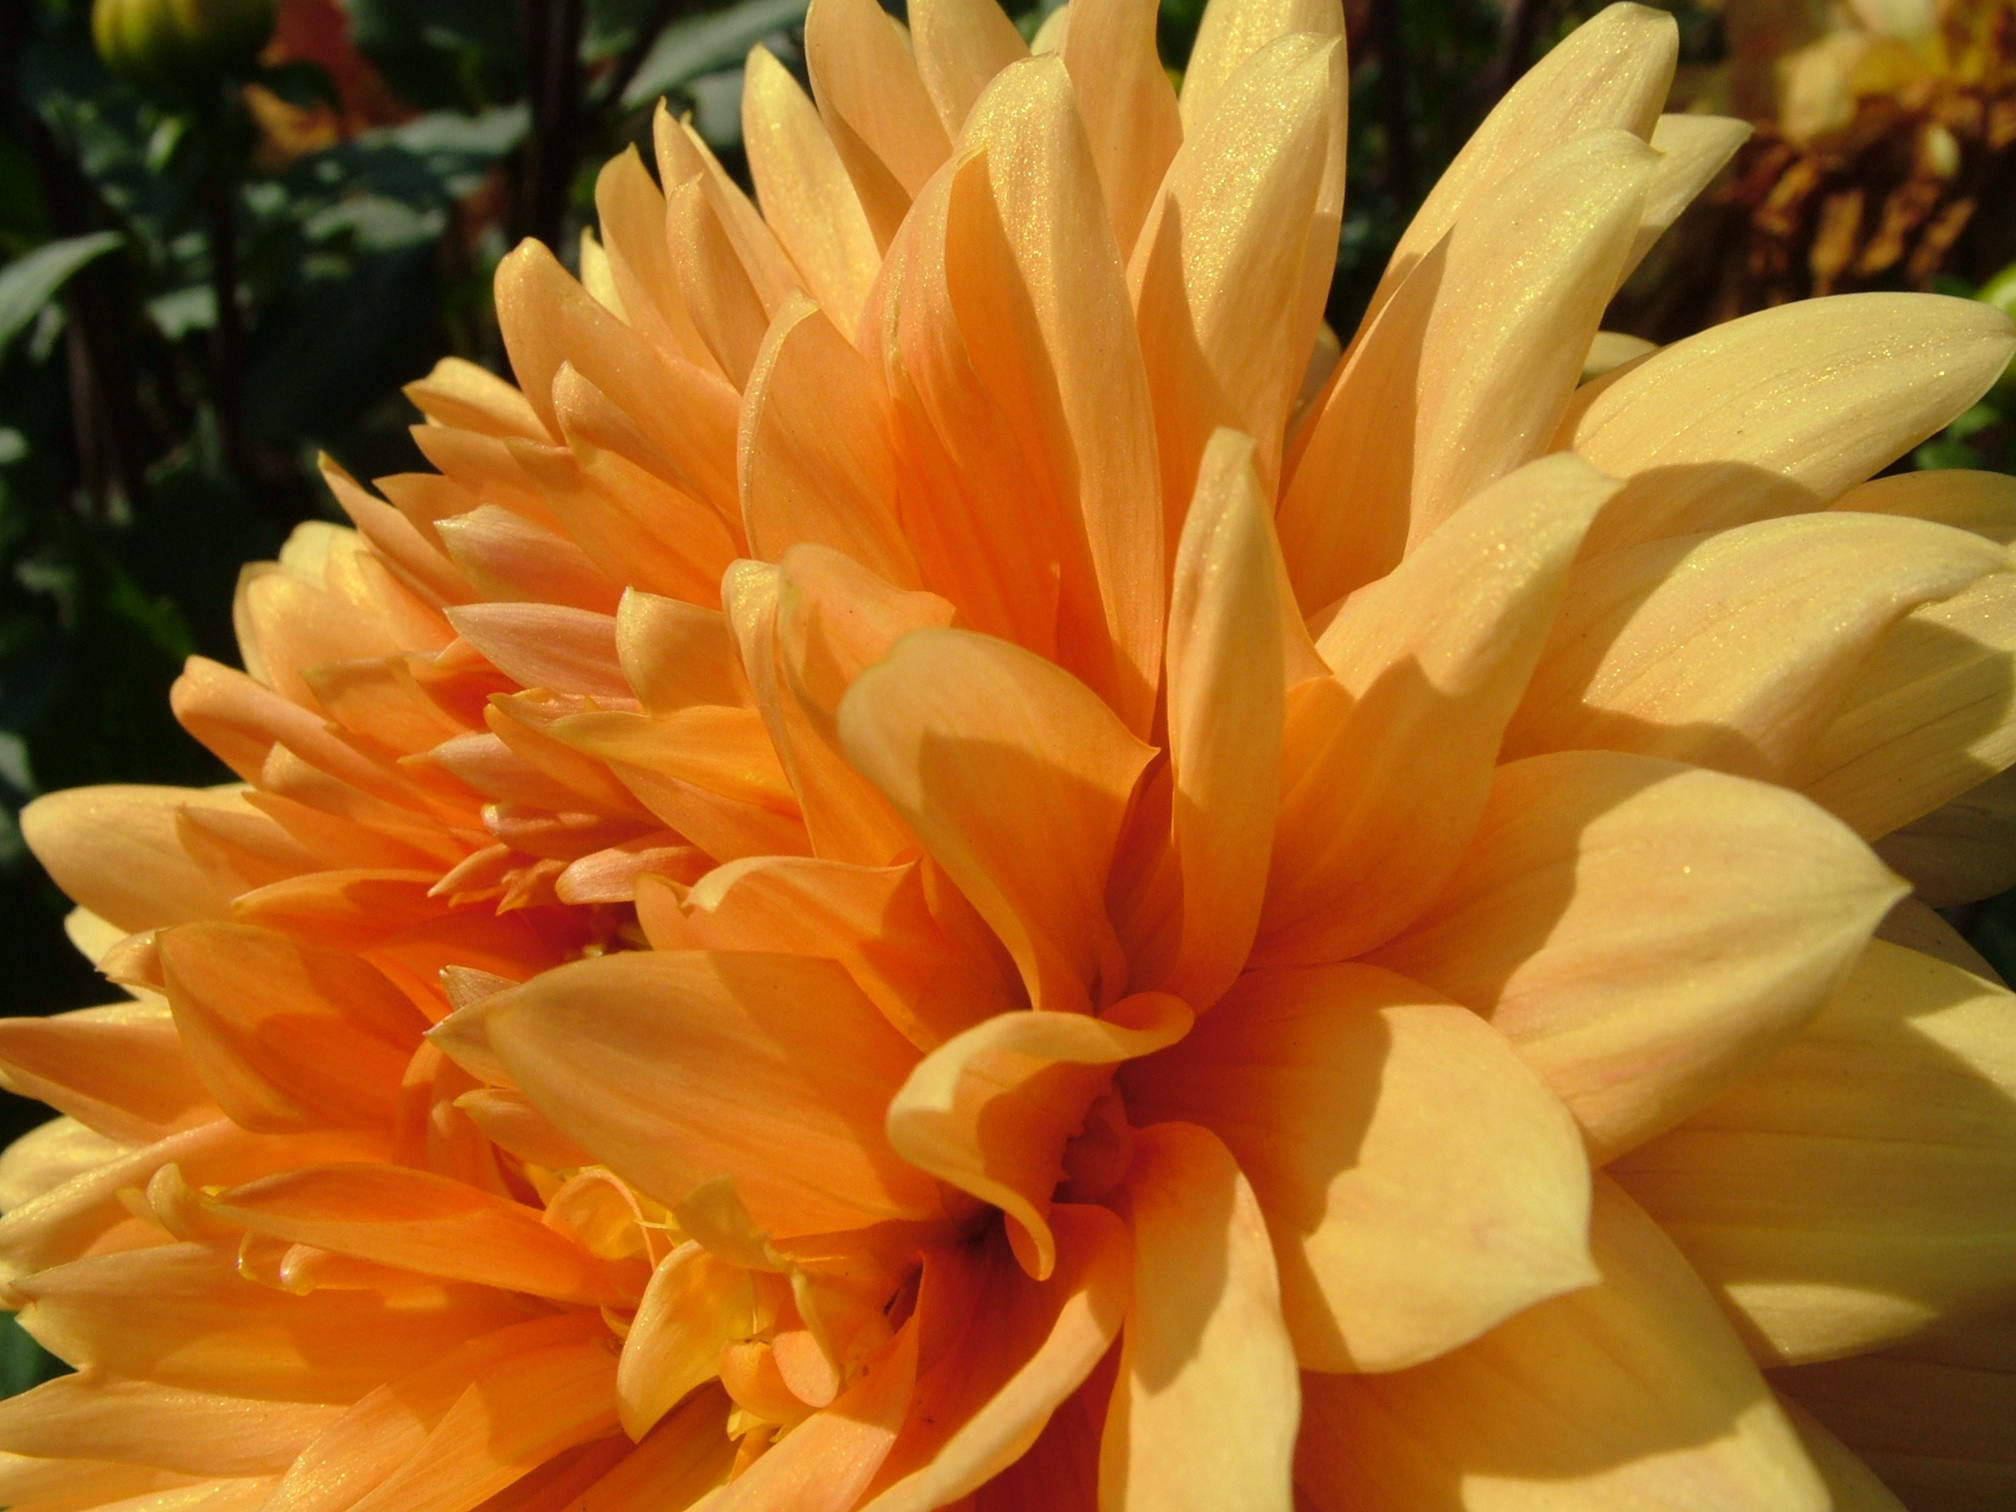 yellow dahlia flower - photo #43